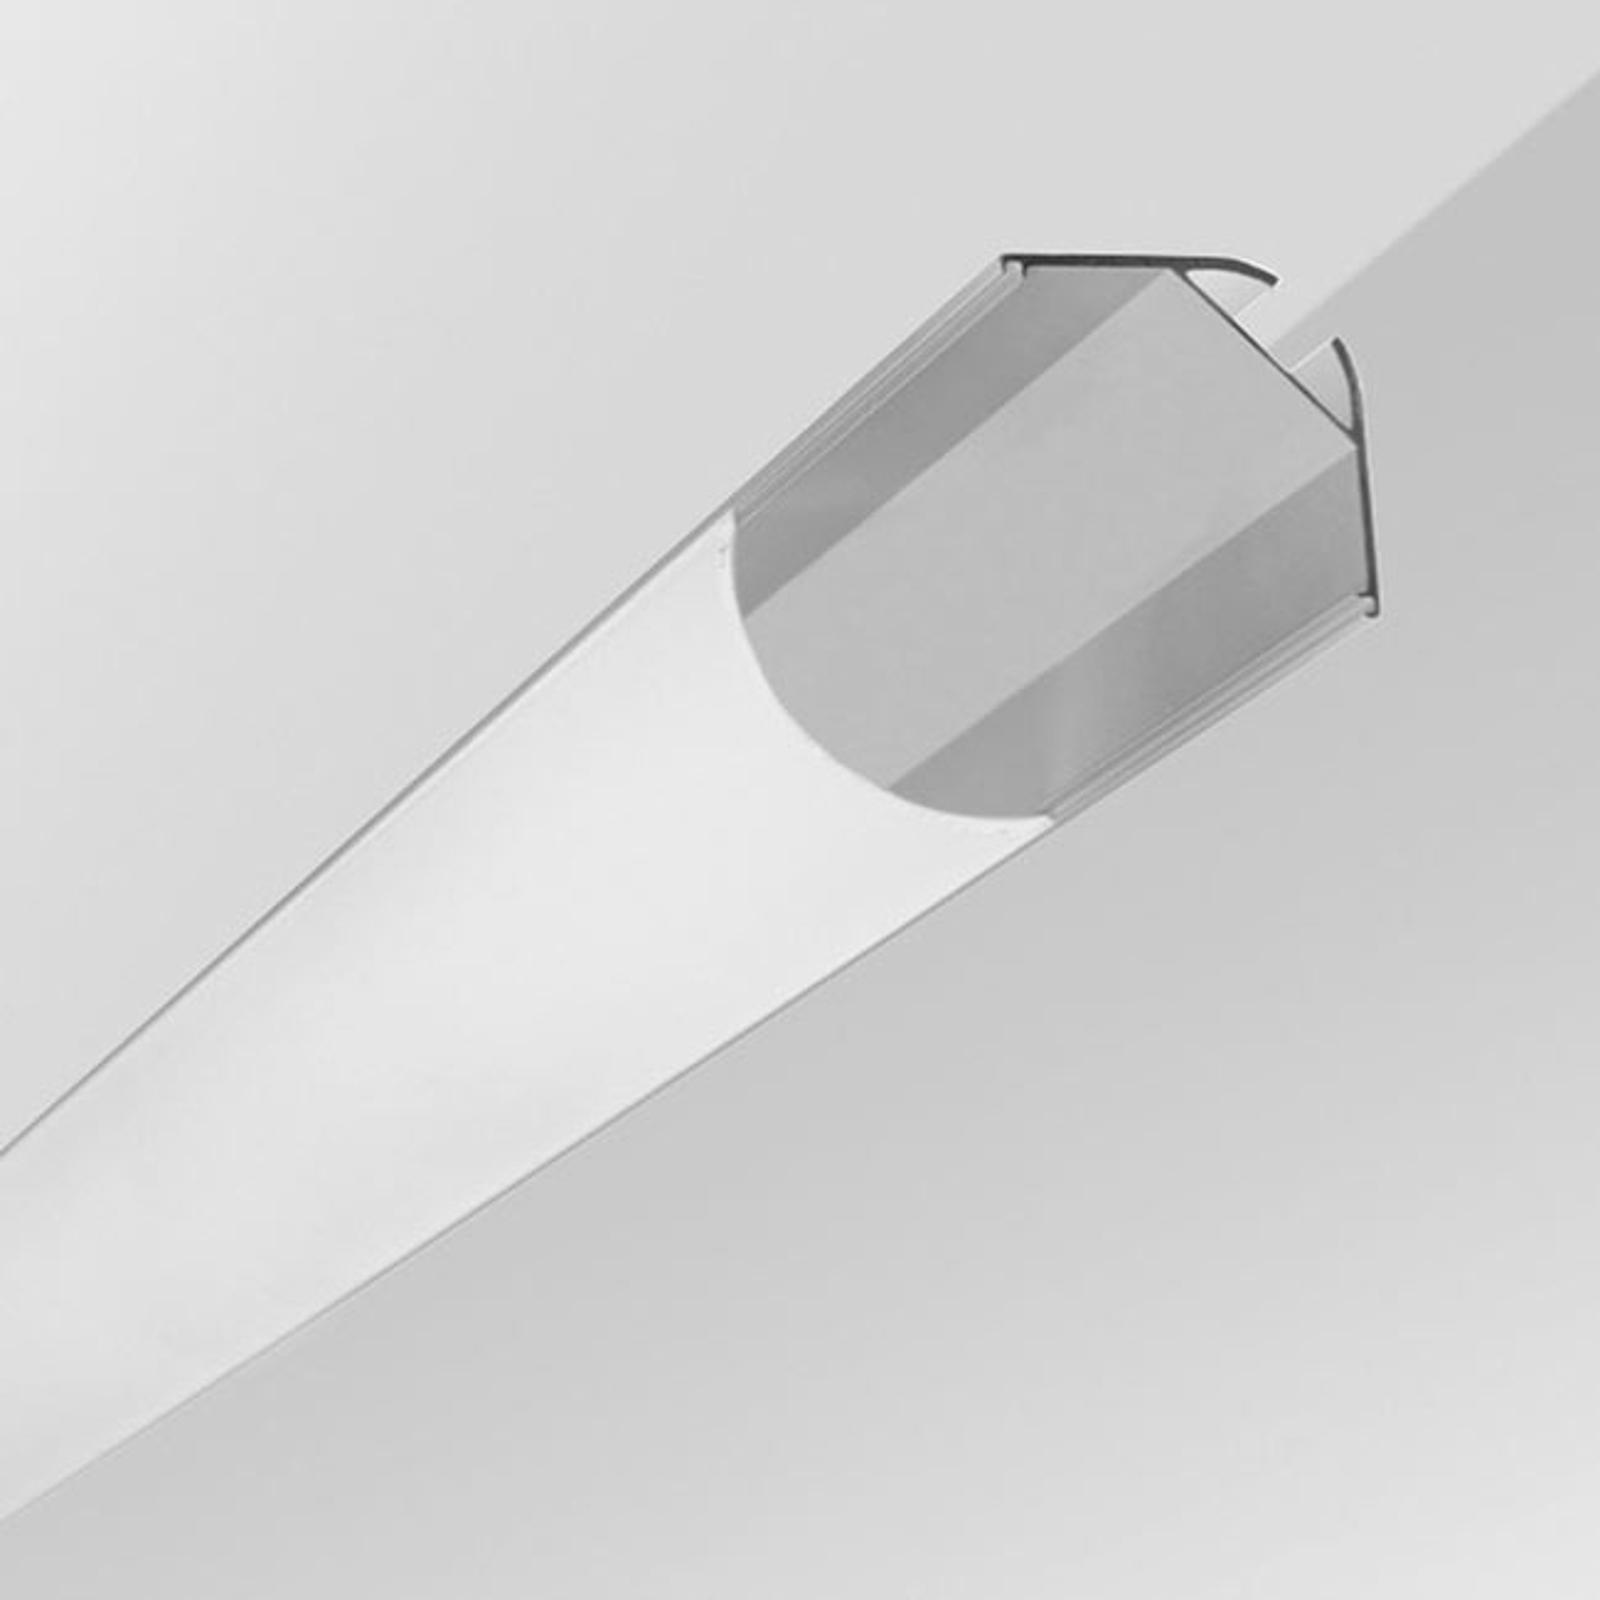 LED-Wandleuchte Sami Parete, Breite 32 cm